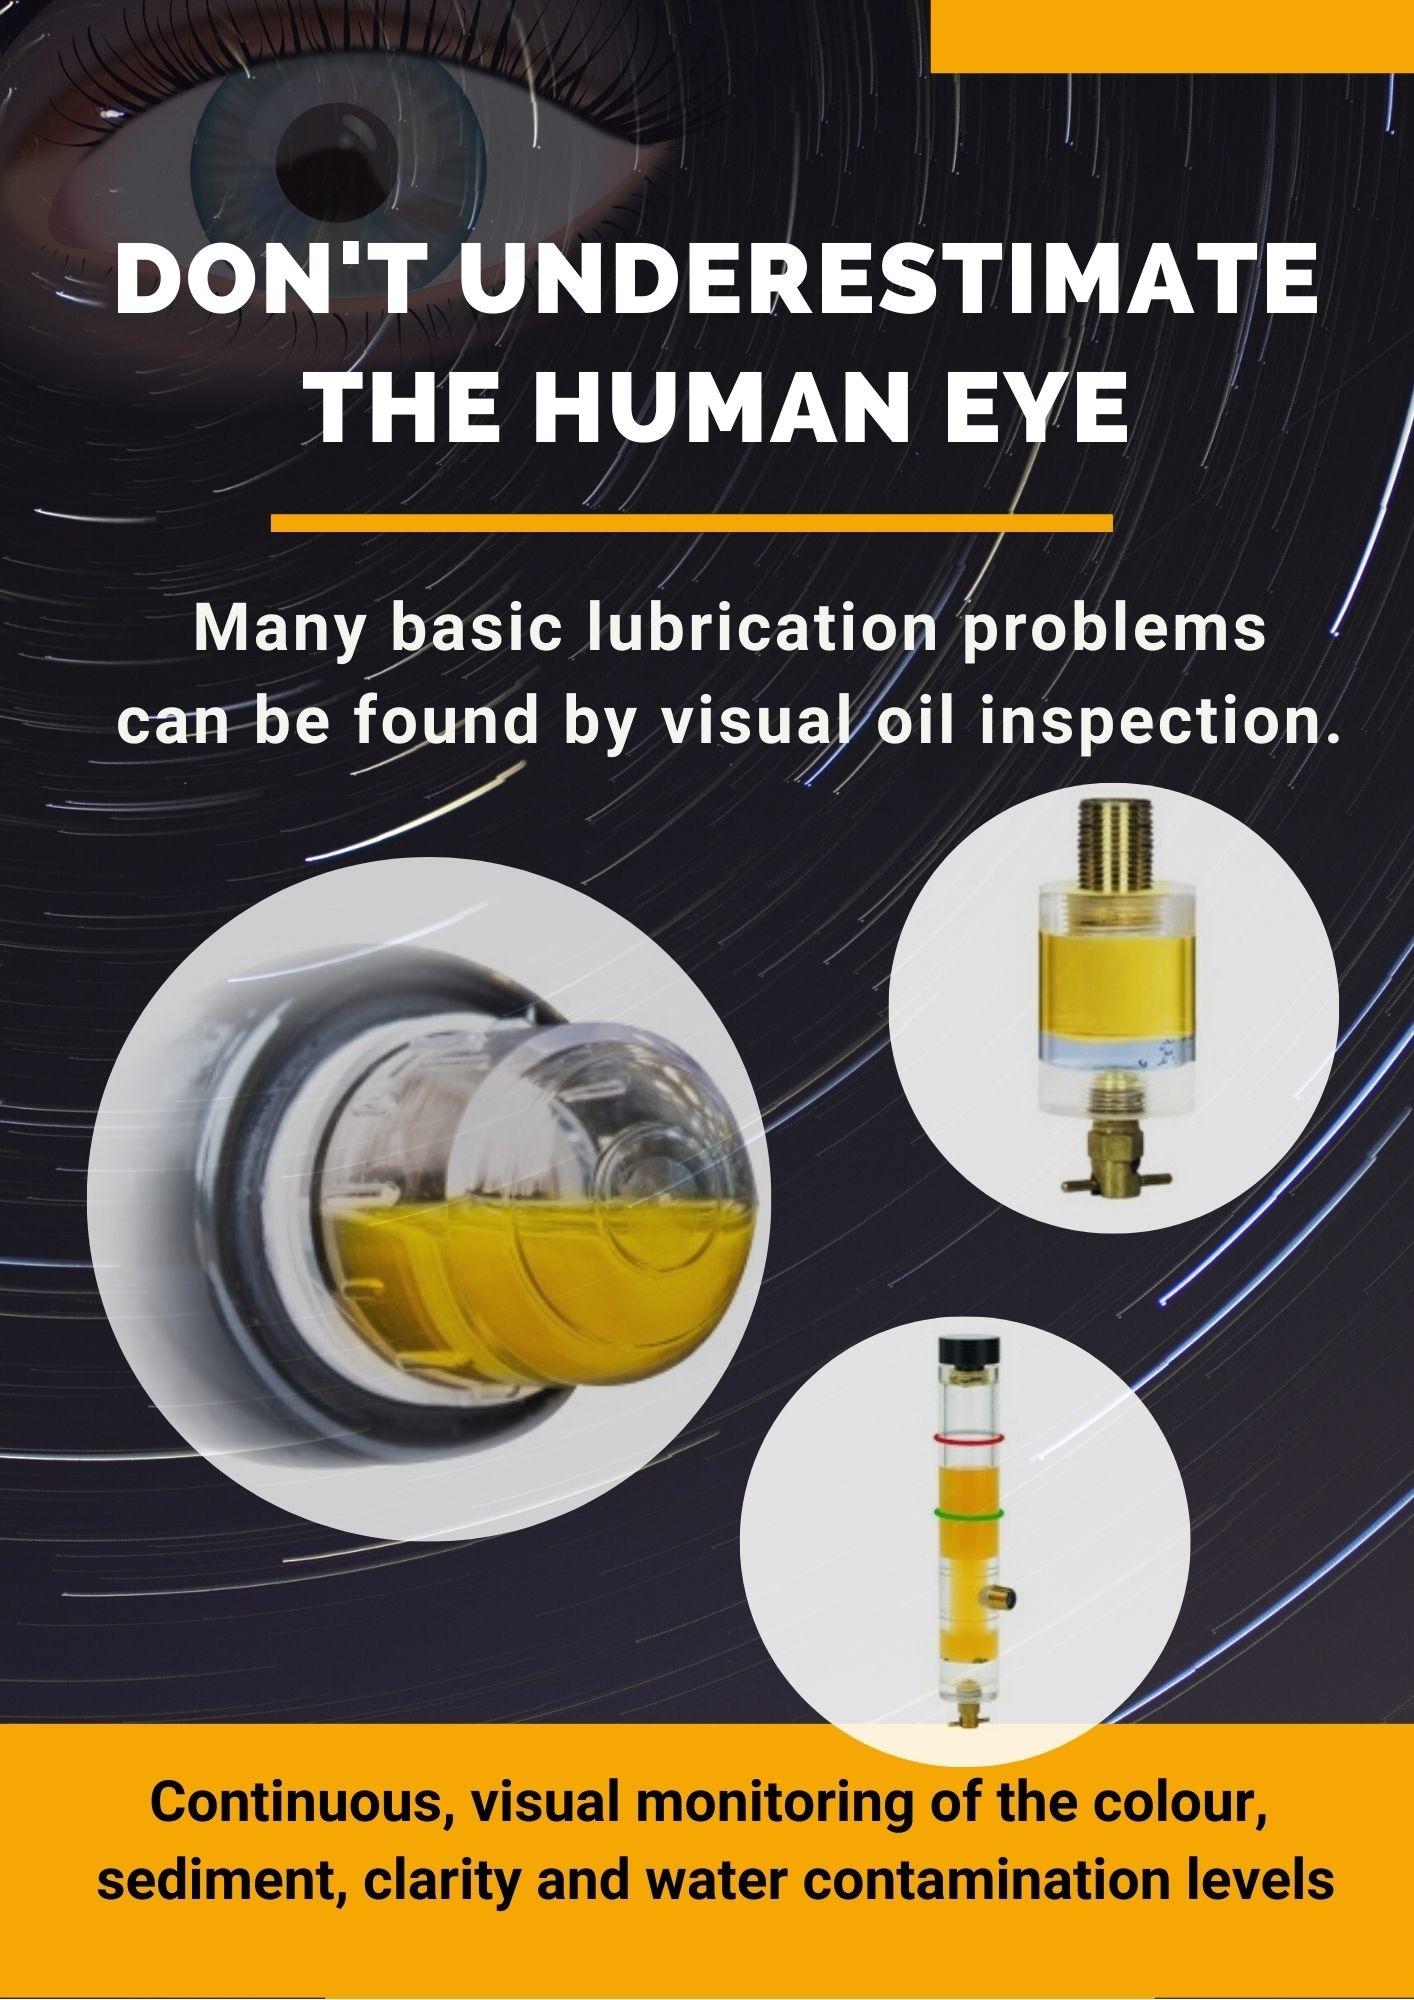 Don't underestimate the human eye